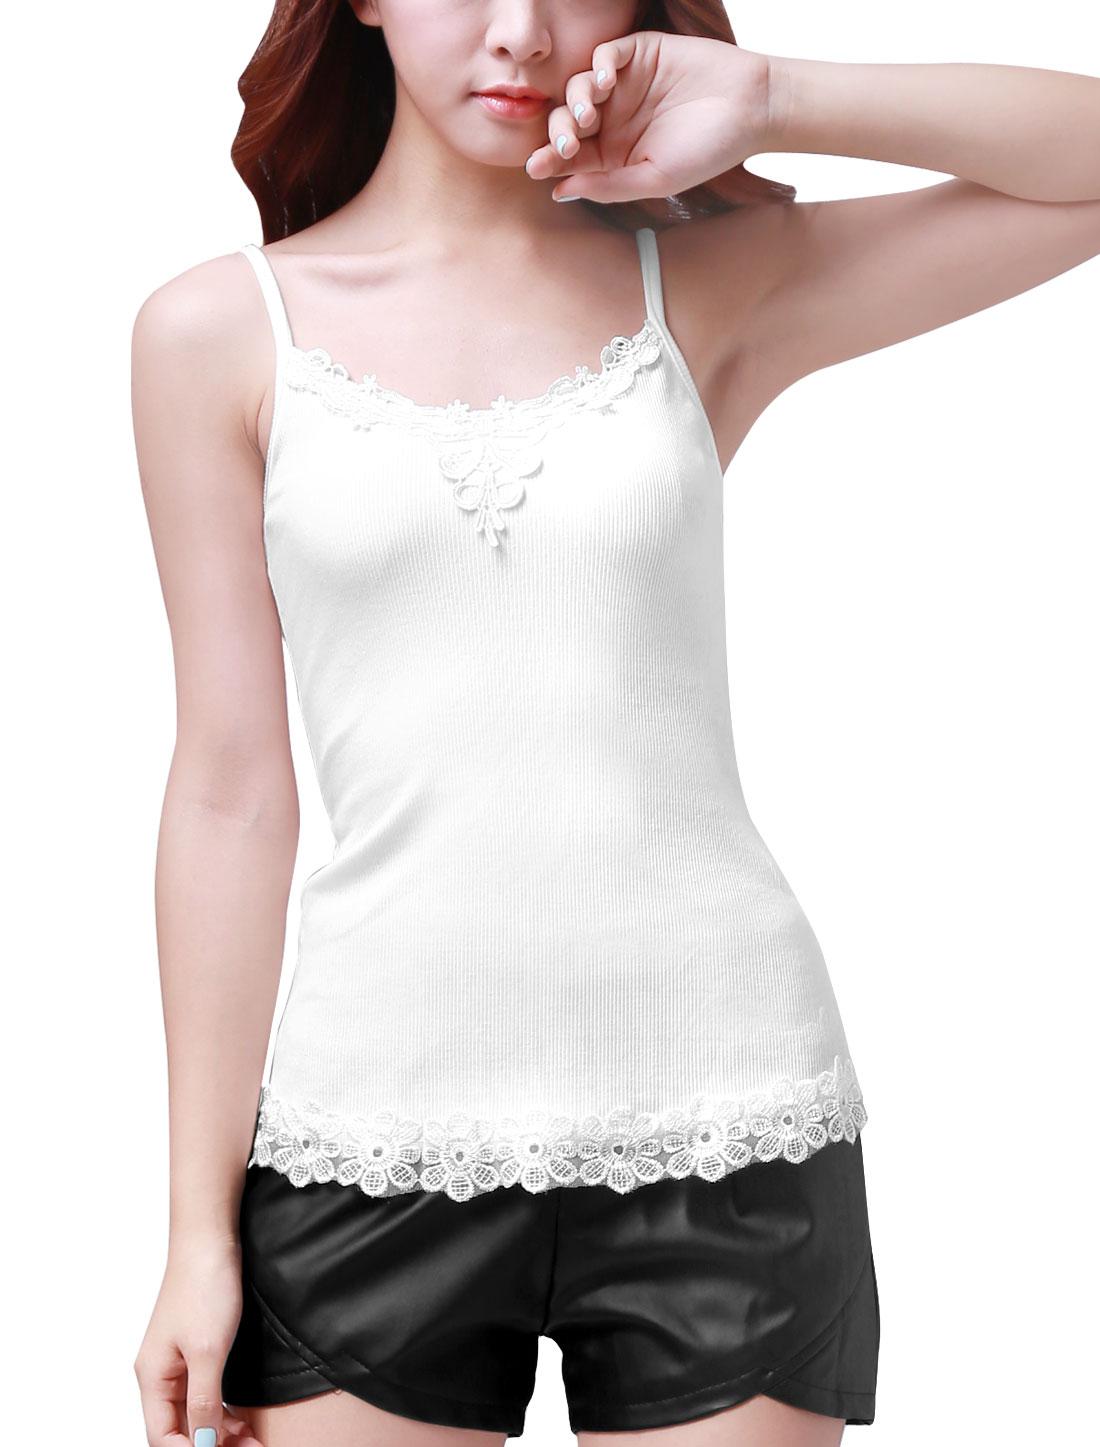 Scoop Neck Sleeveless White Ribbing Tank Top XS for Women